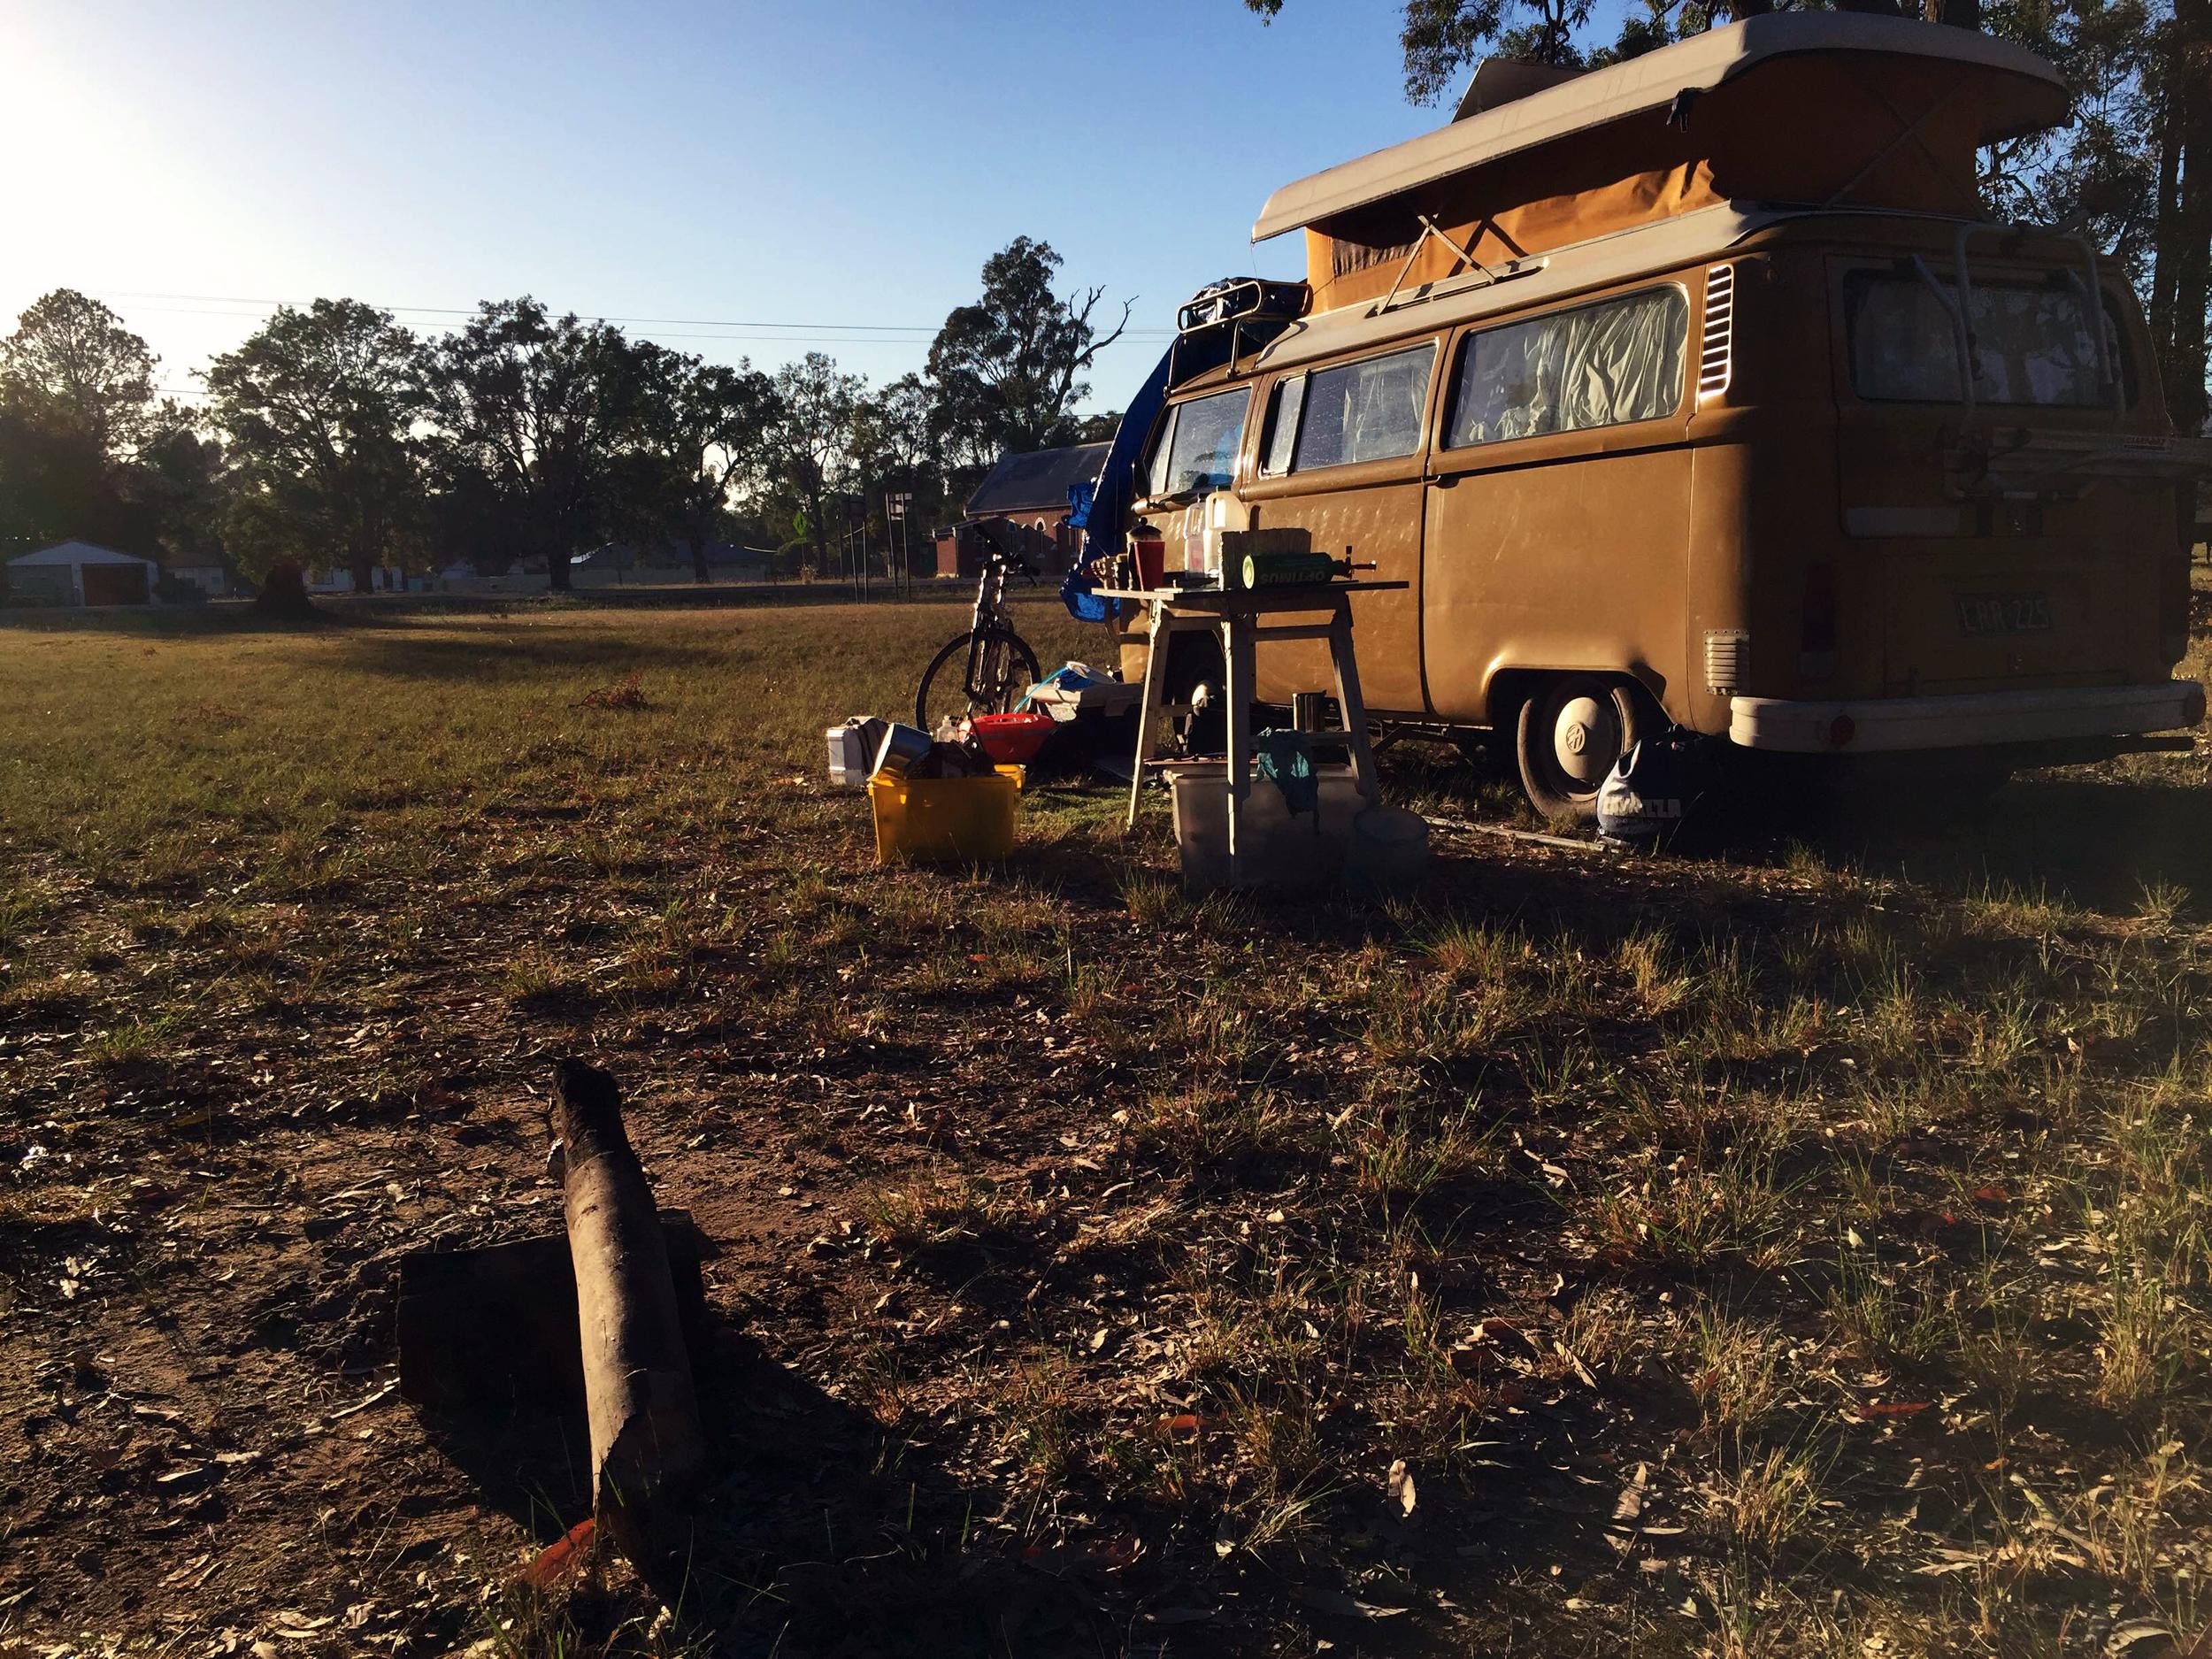 Free camping, morning sun & breakfast